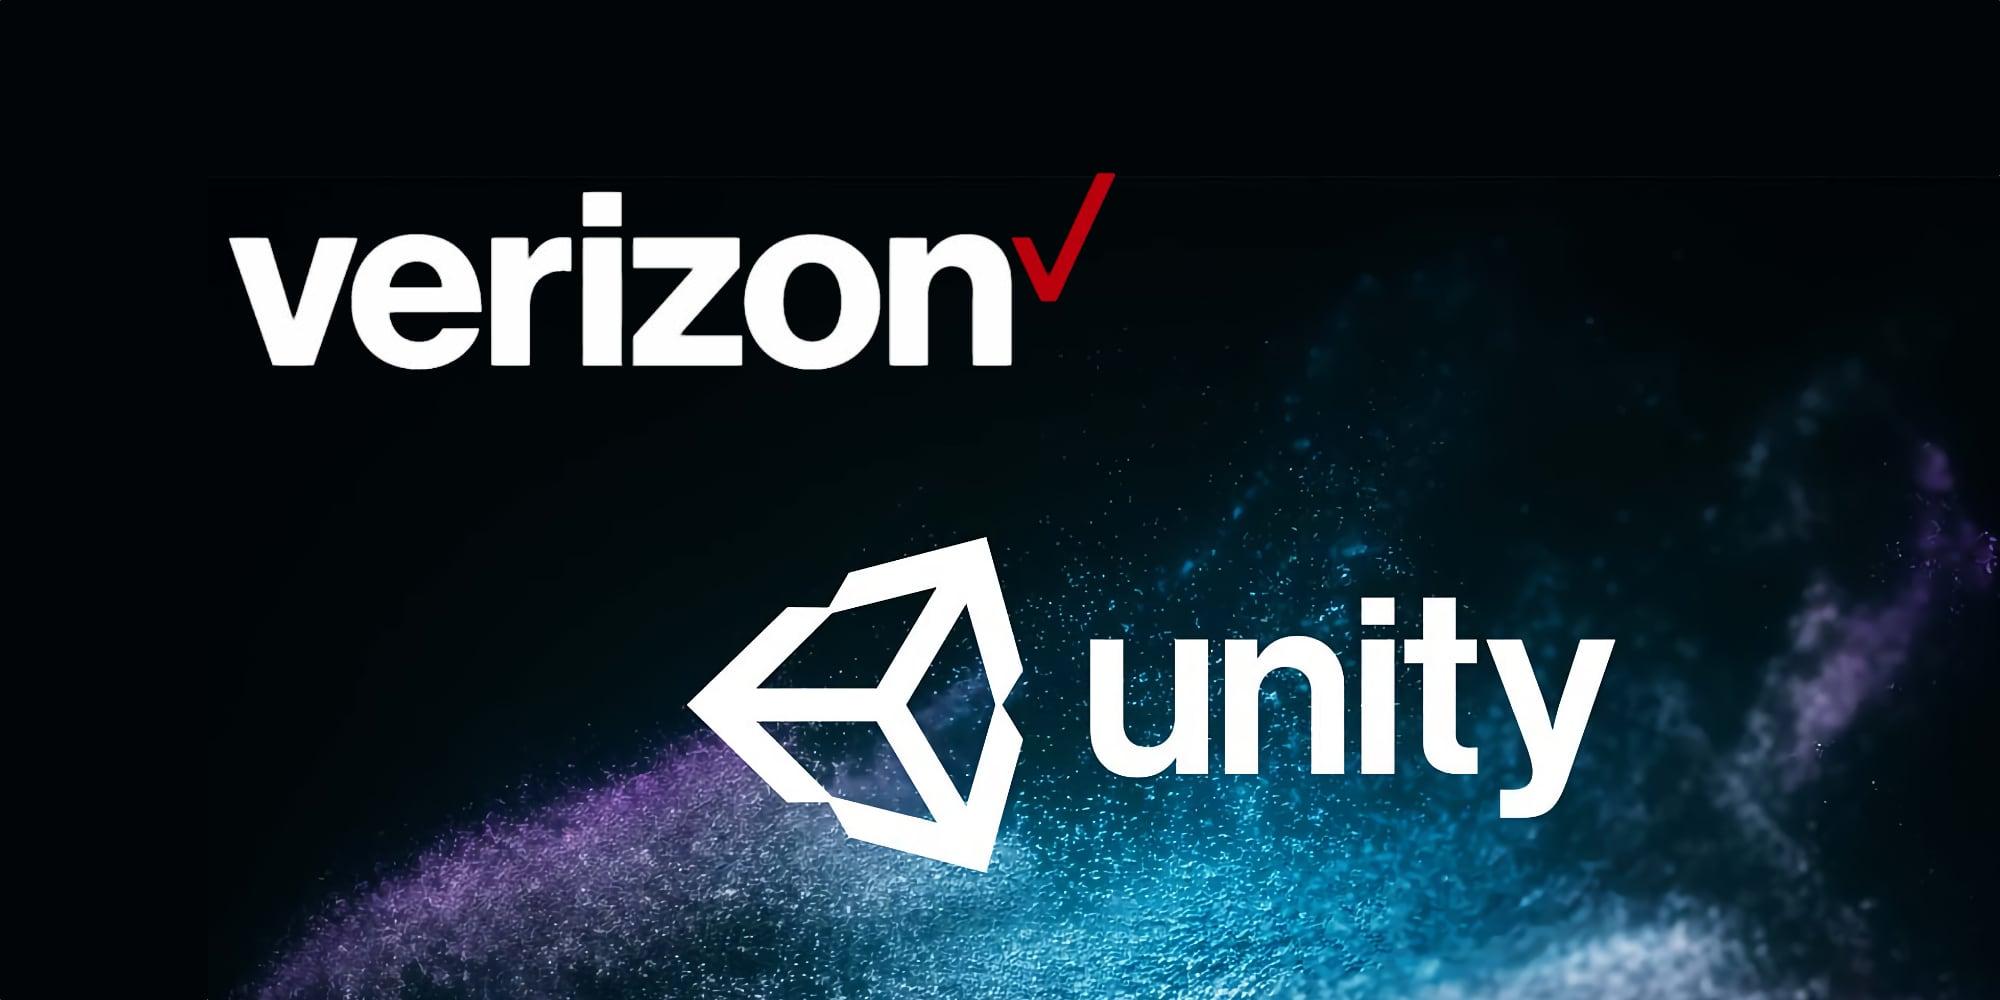 venturebeat.com - Jeremy Horwitz - Verizon picks Unity as 5G MEC partner for 3D enterprise apps and games